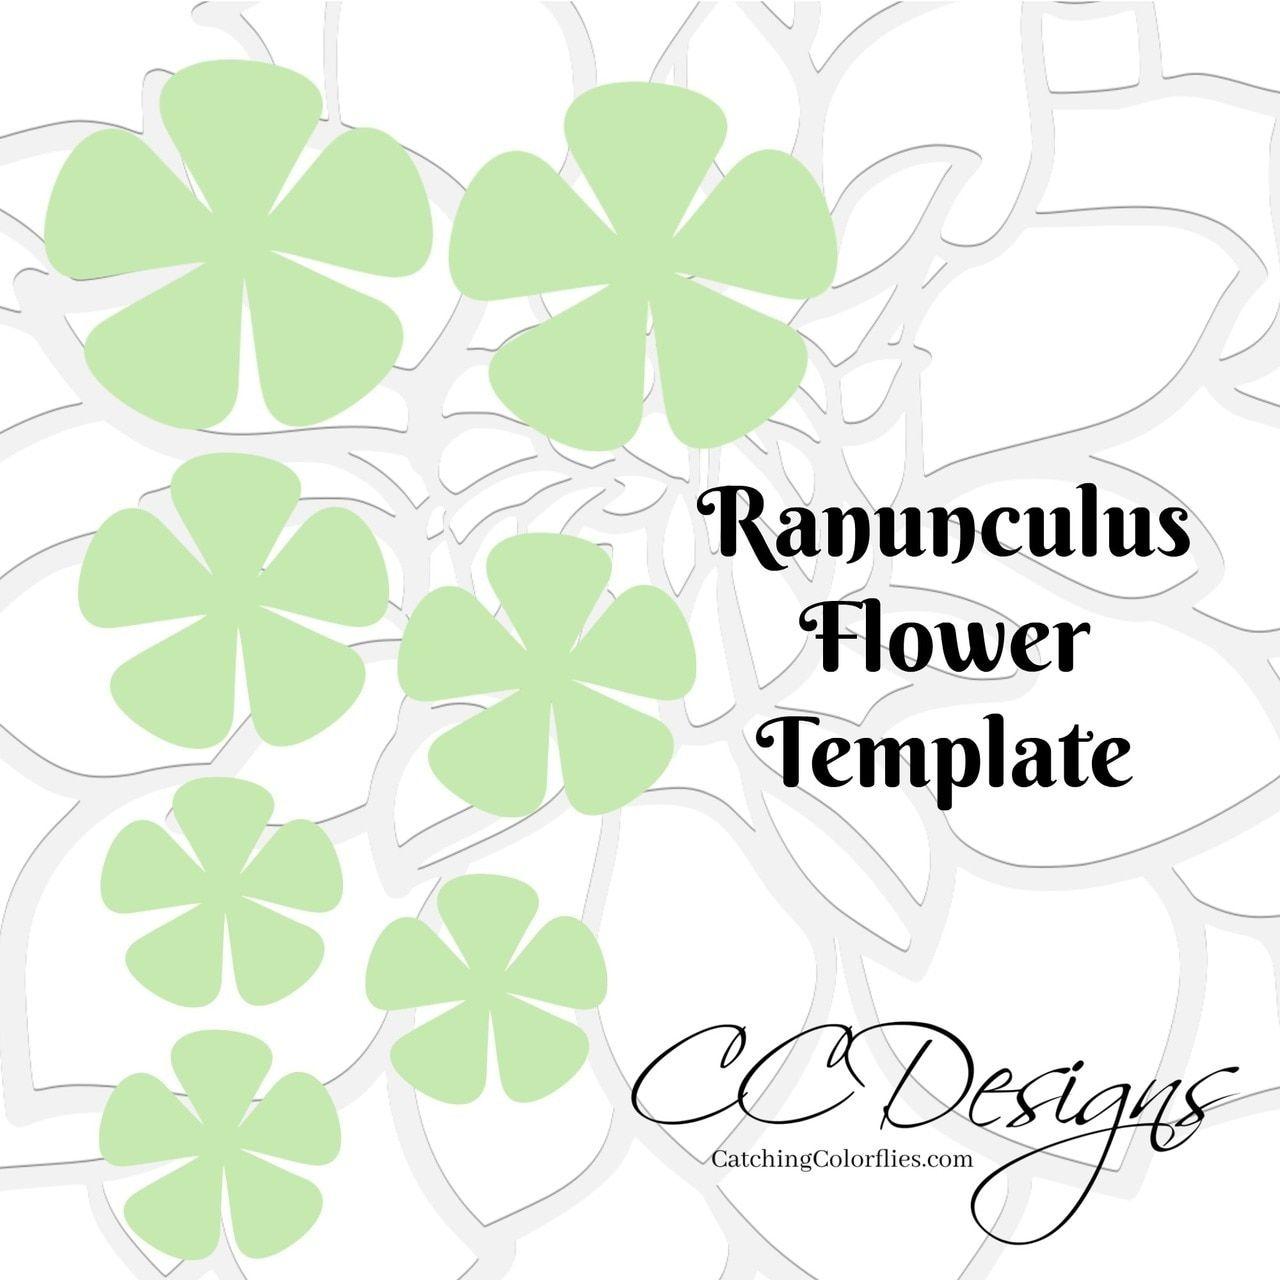 Ranunculus Paper Flower Templates Flower Template Paper Flowers Diy Paper Flower Template